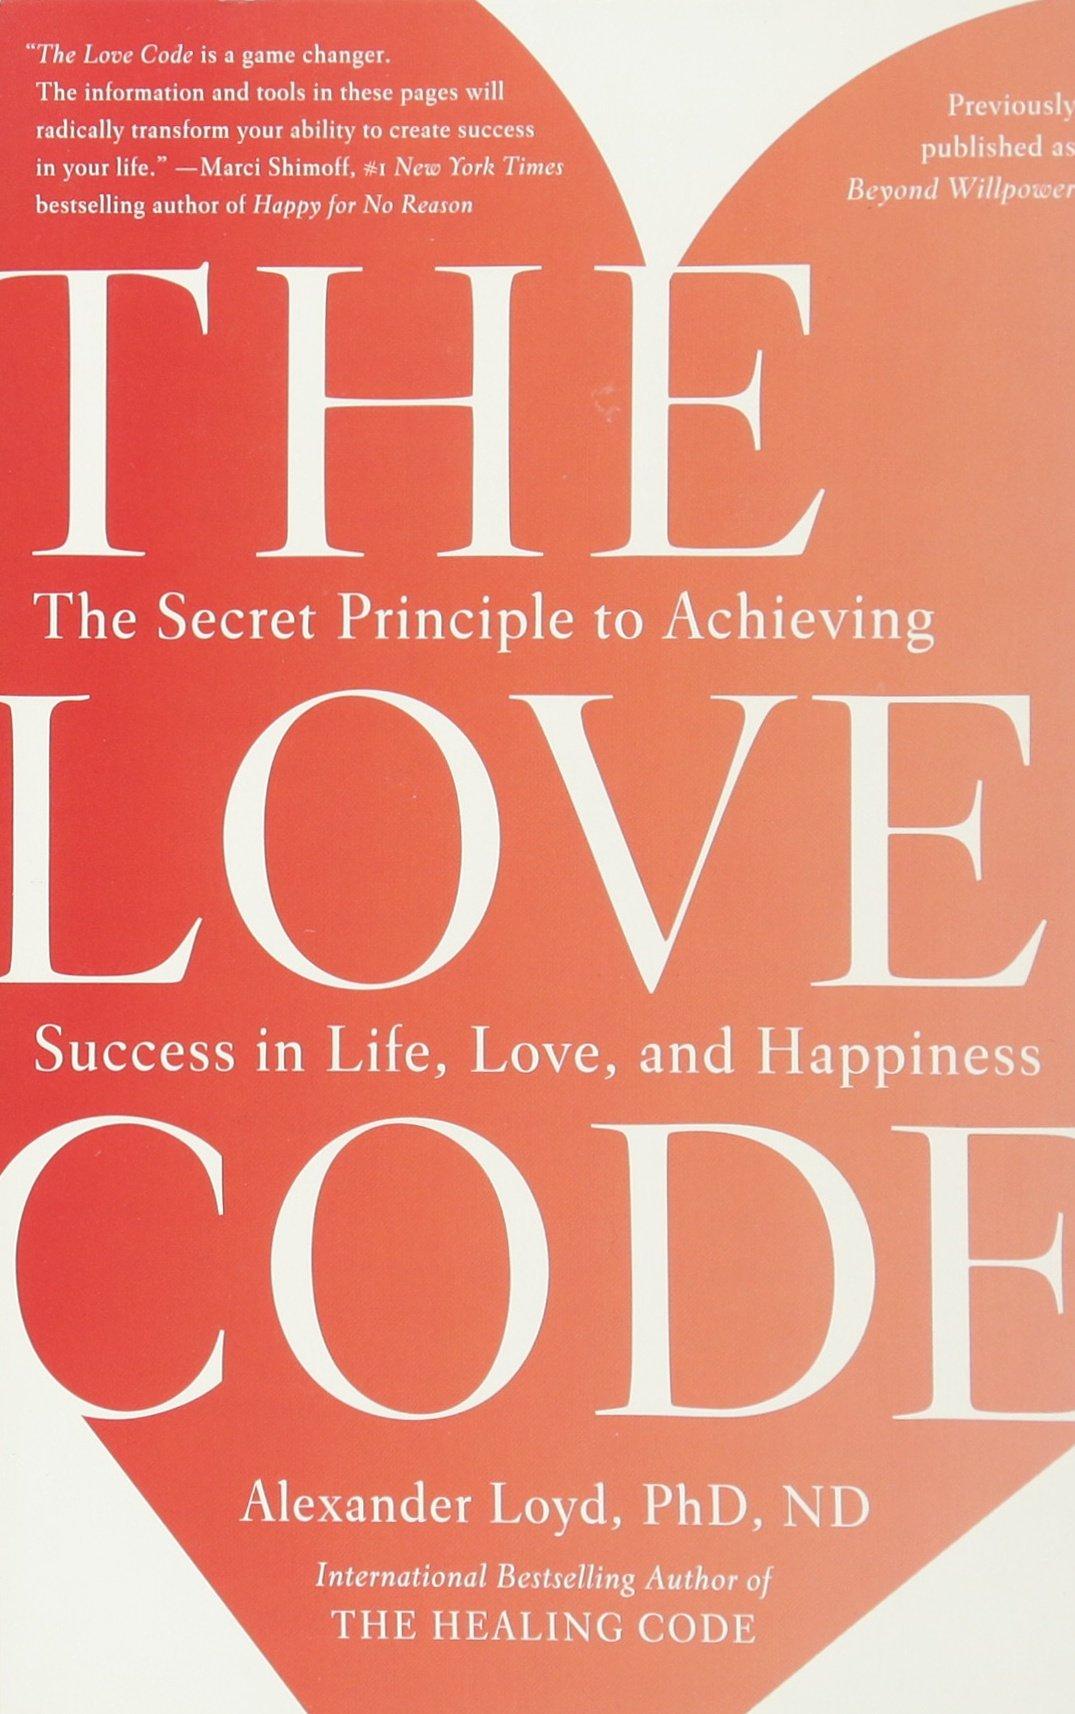 Healing Codes Coaching - the-love-code-review